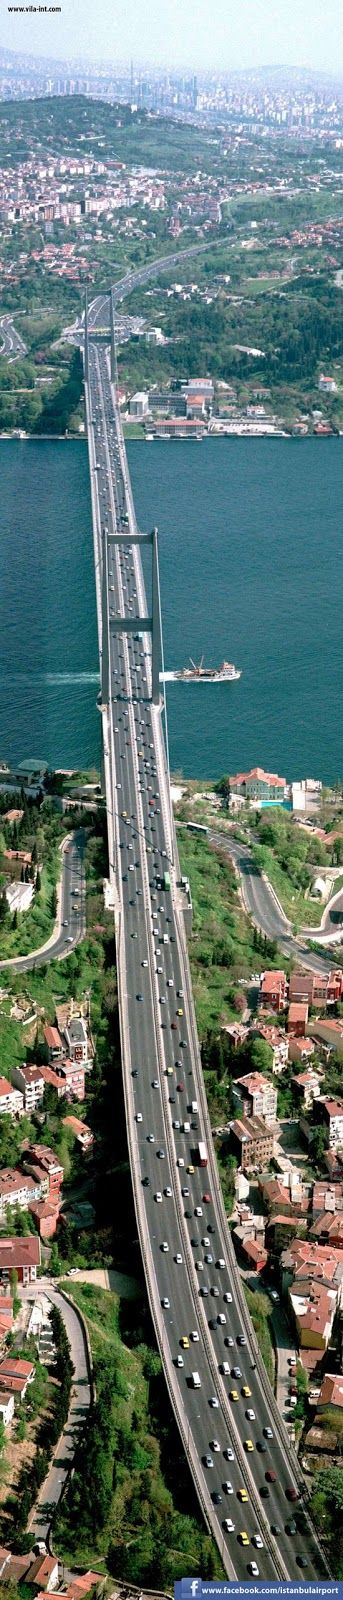 Bosphorus Istanbul, Turkey